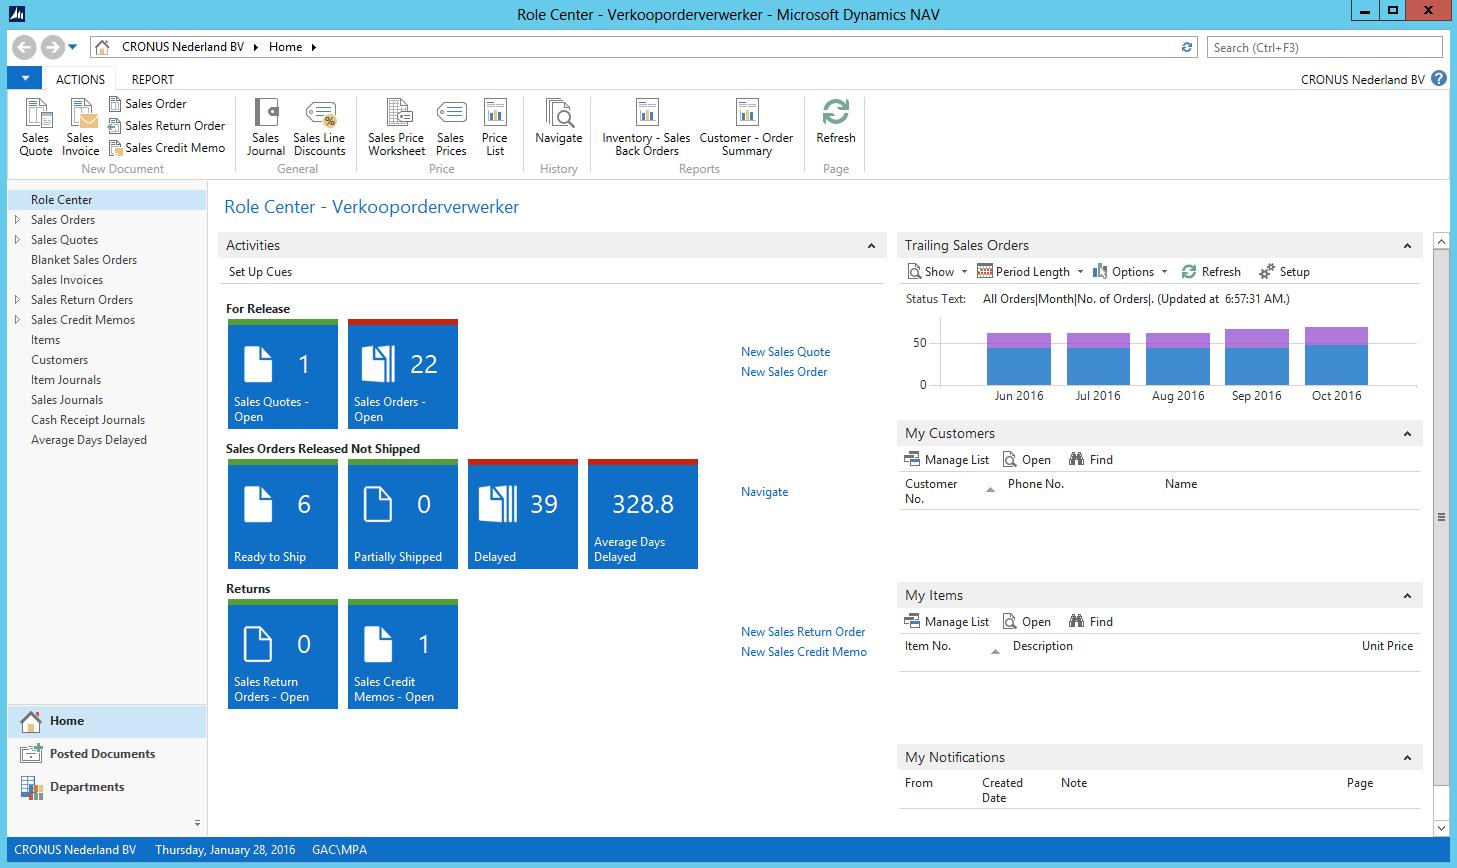 Microsoft Dynamics NAV: Auditing & Certification (SAS 70, ISO 27001/2, TRUSTe), Extranet, Intranet & Community